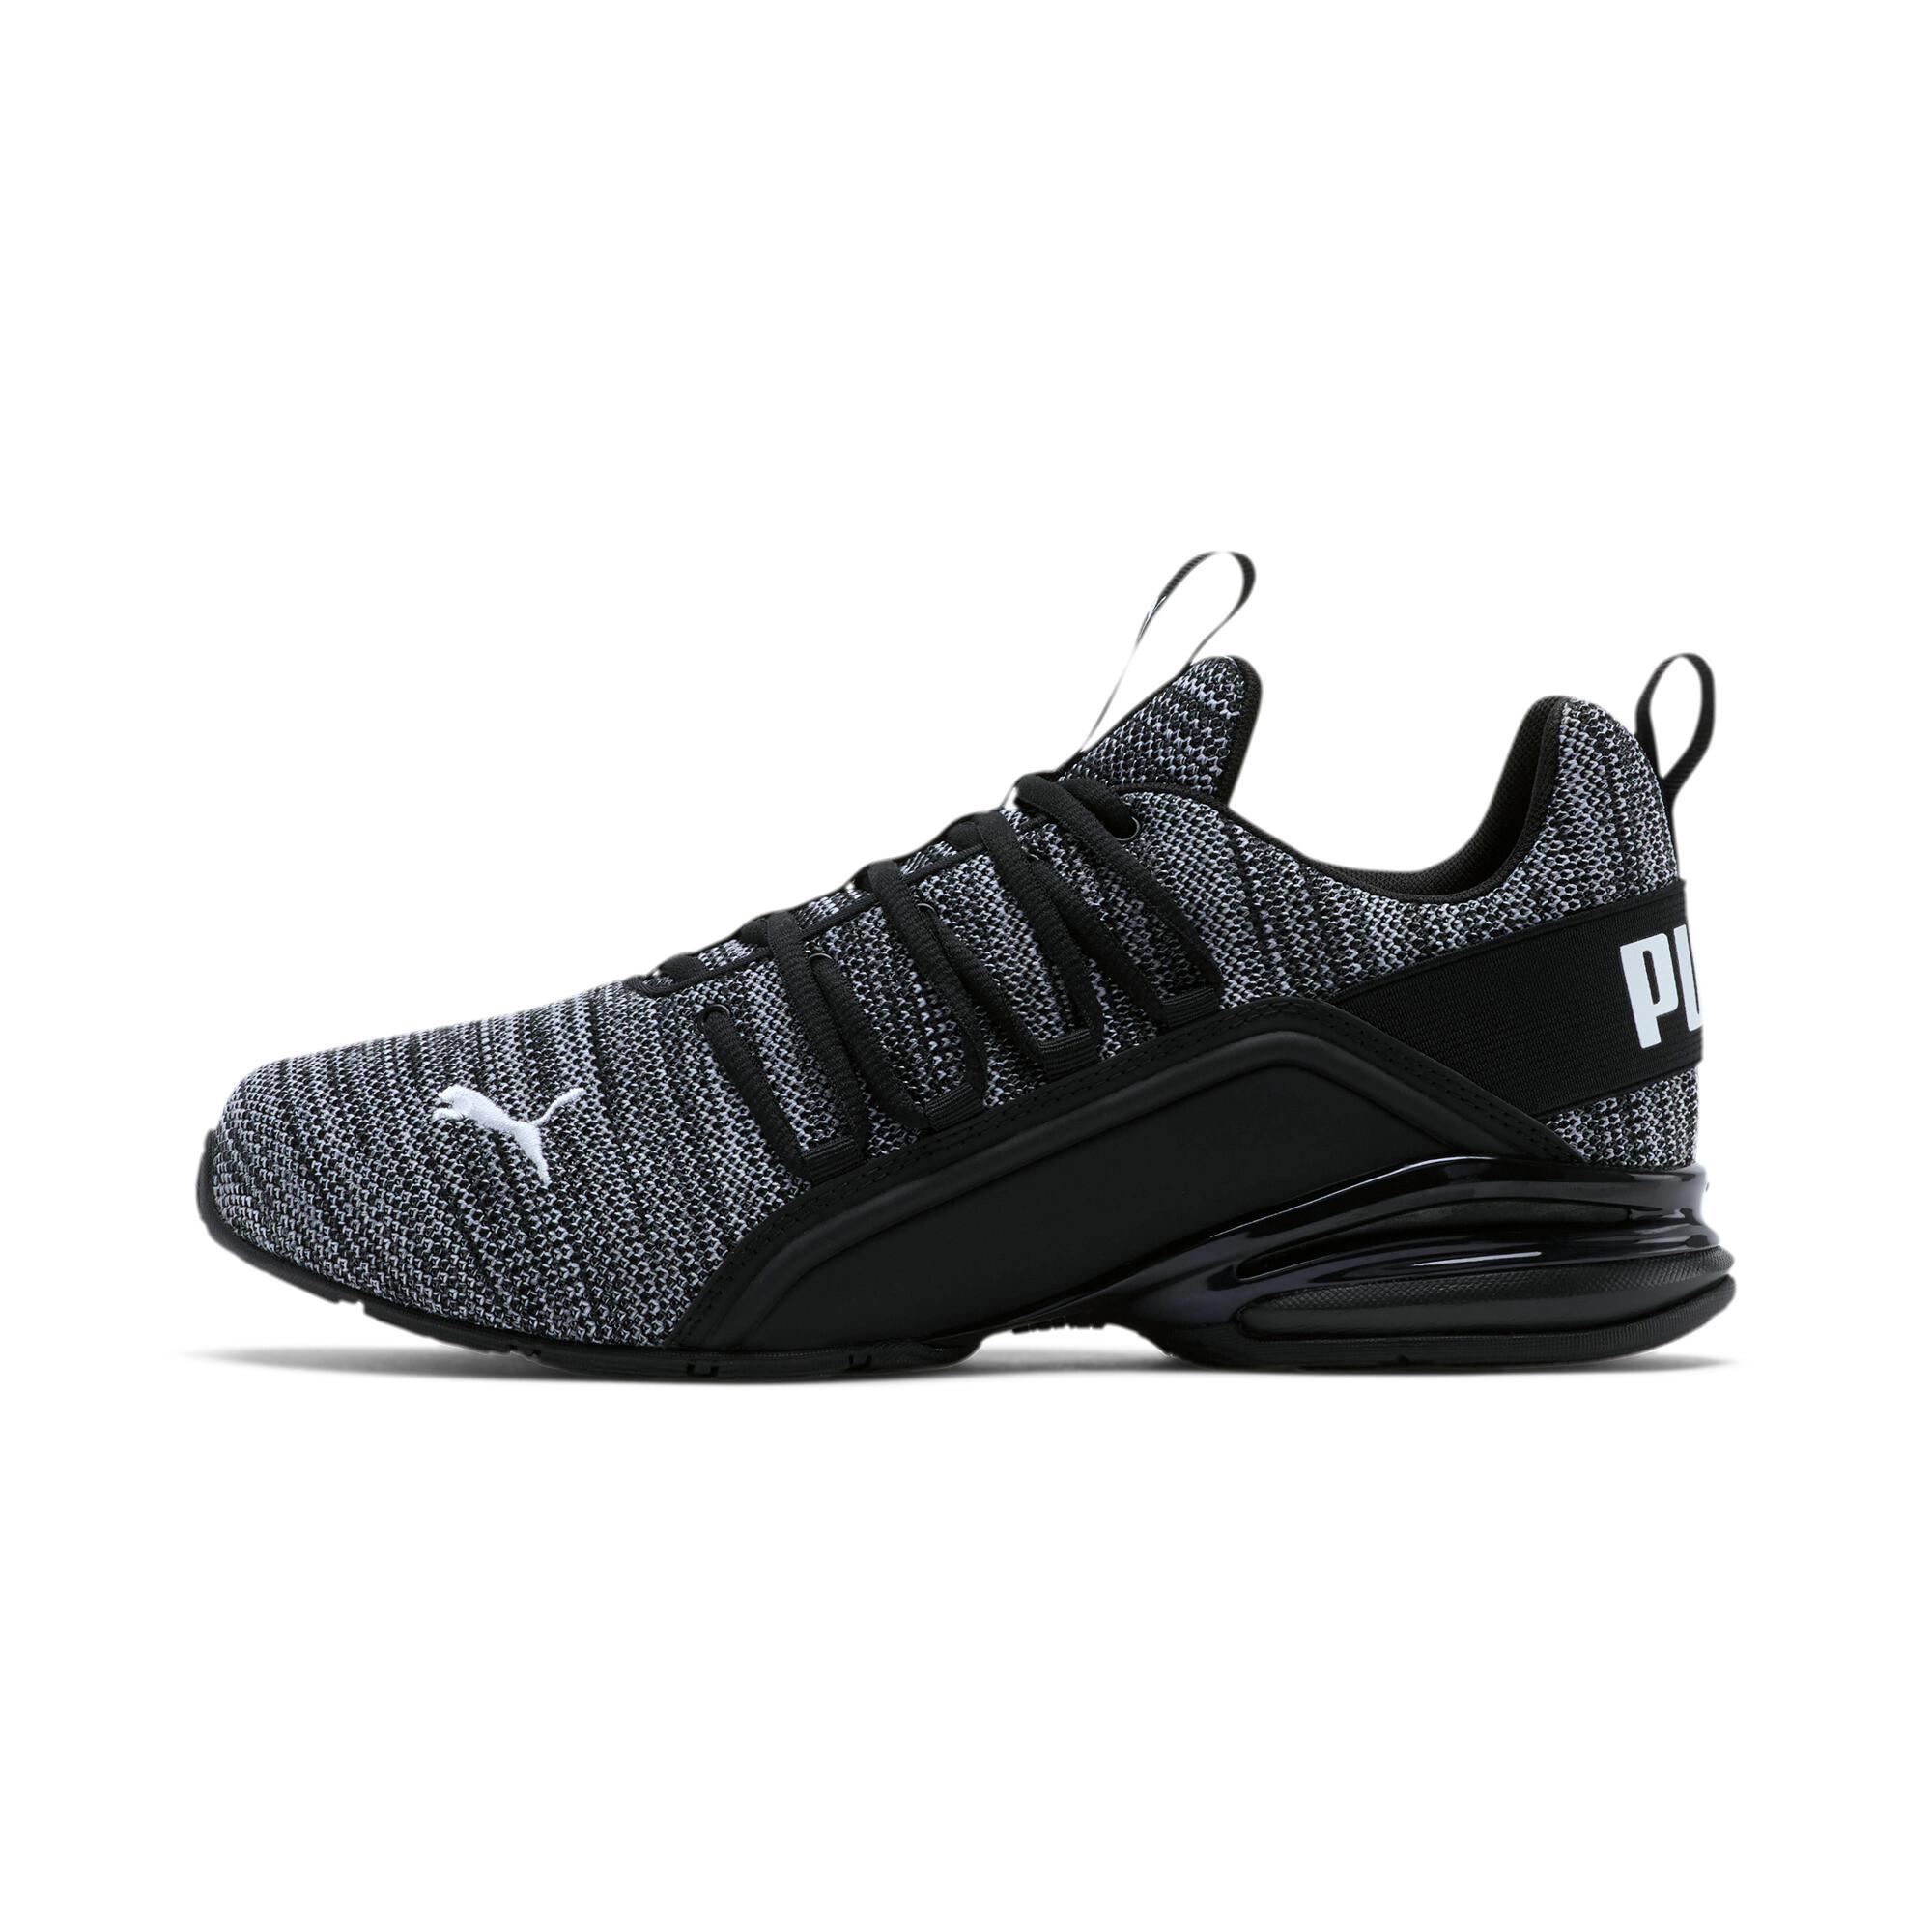 PUMA-Men-039-s-Momenta-Wide-Training-Shoes thumbnail 4